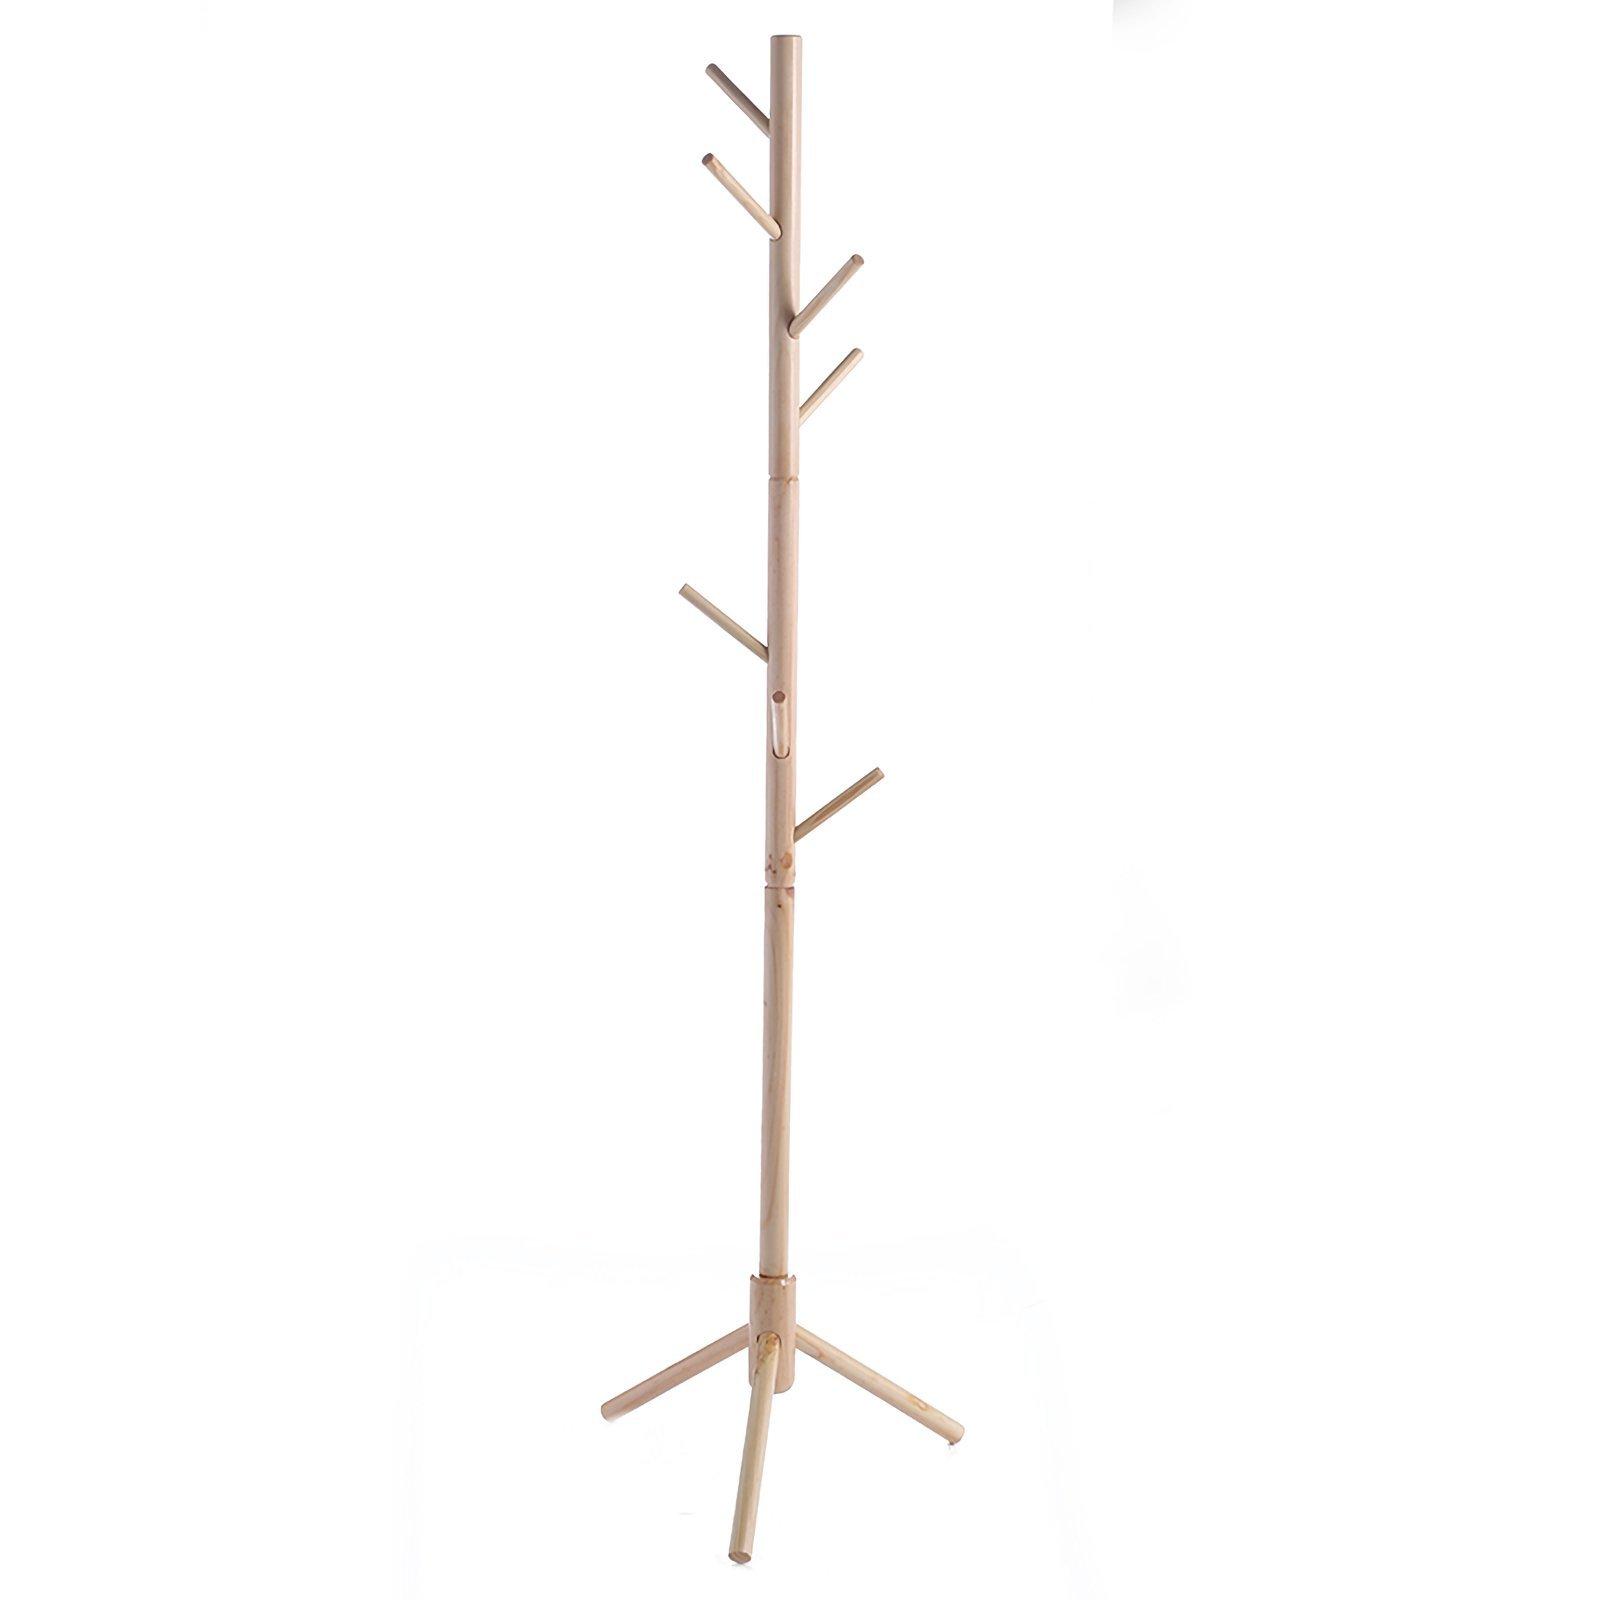 JOYBASE 8 hooks Wooden Coat Rack/Clothes Hanger Stand, for Coats, Hats, Scarves, Jacket and Handbags(Natural)